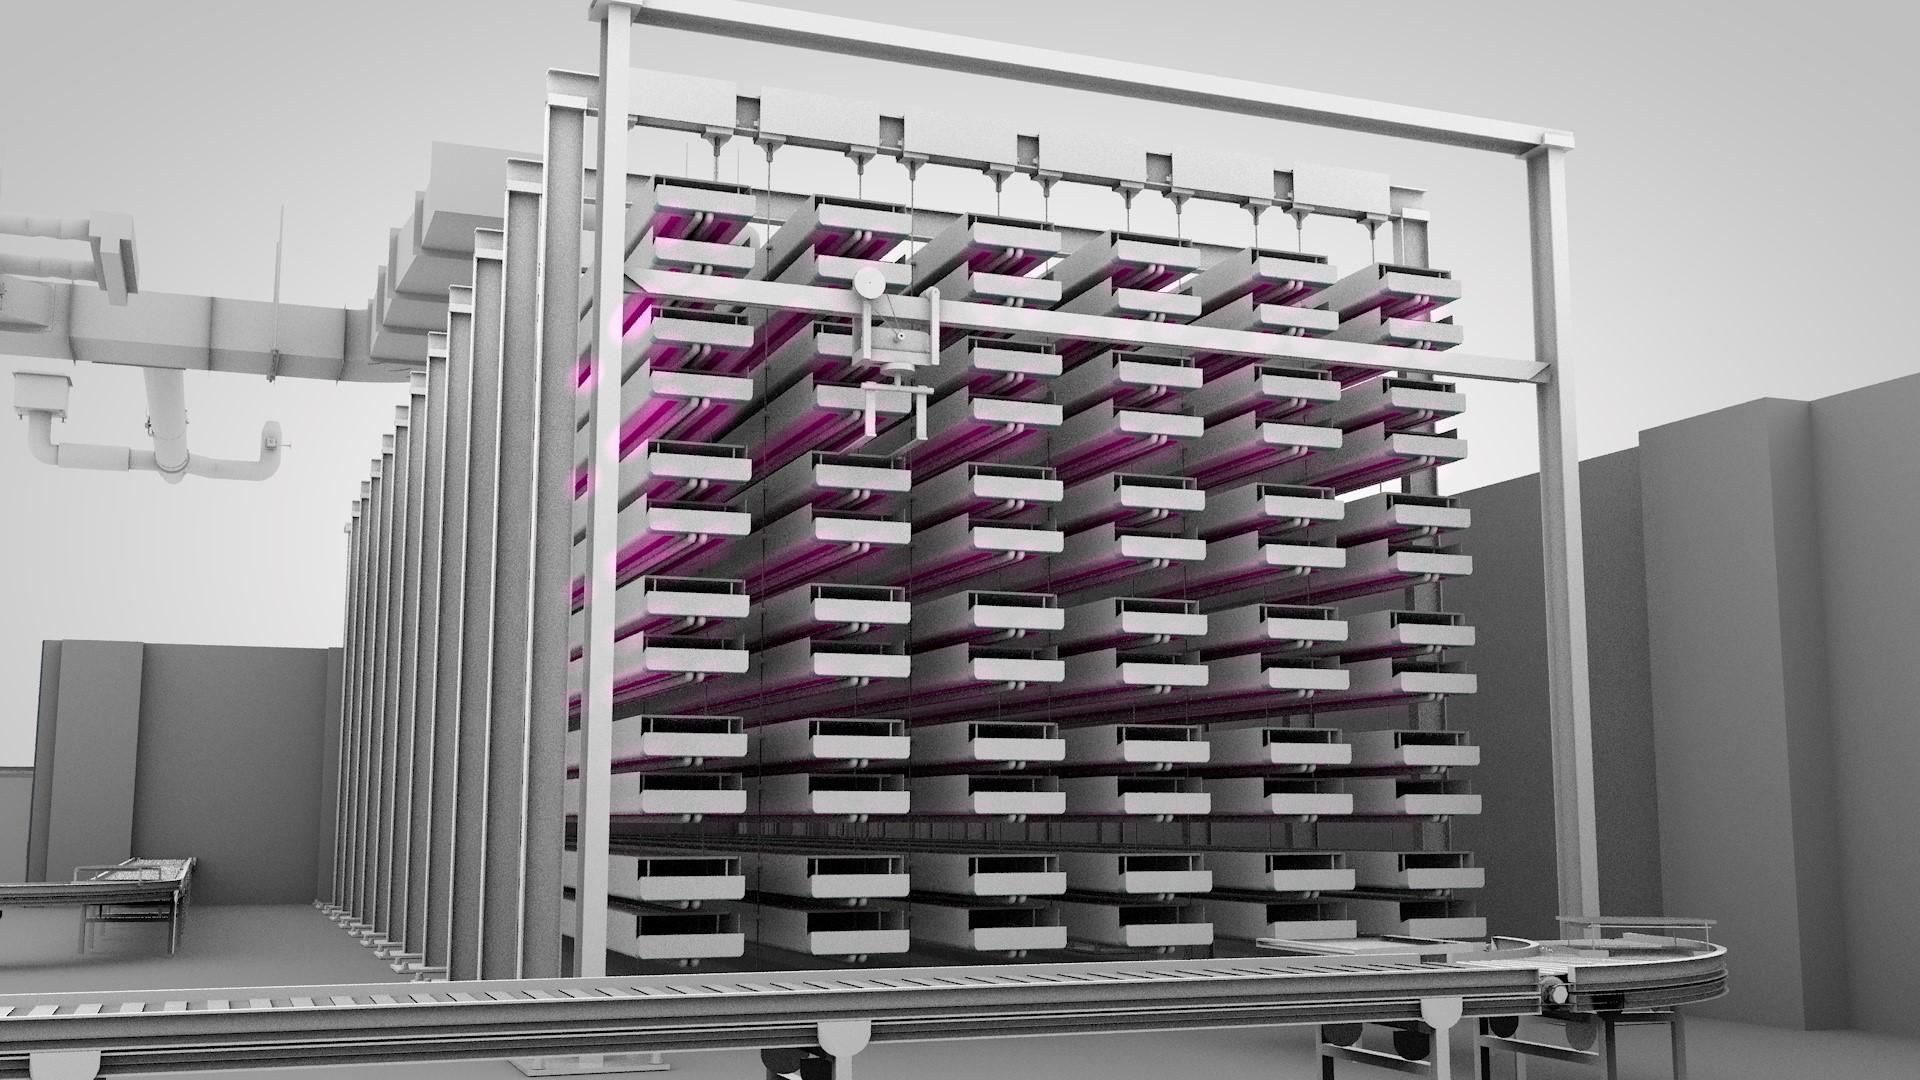 Automated Vertical Farm Design - Vertical Future